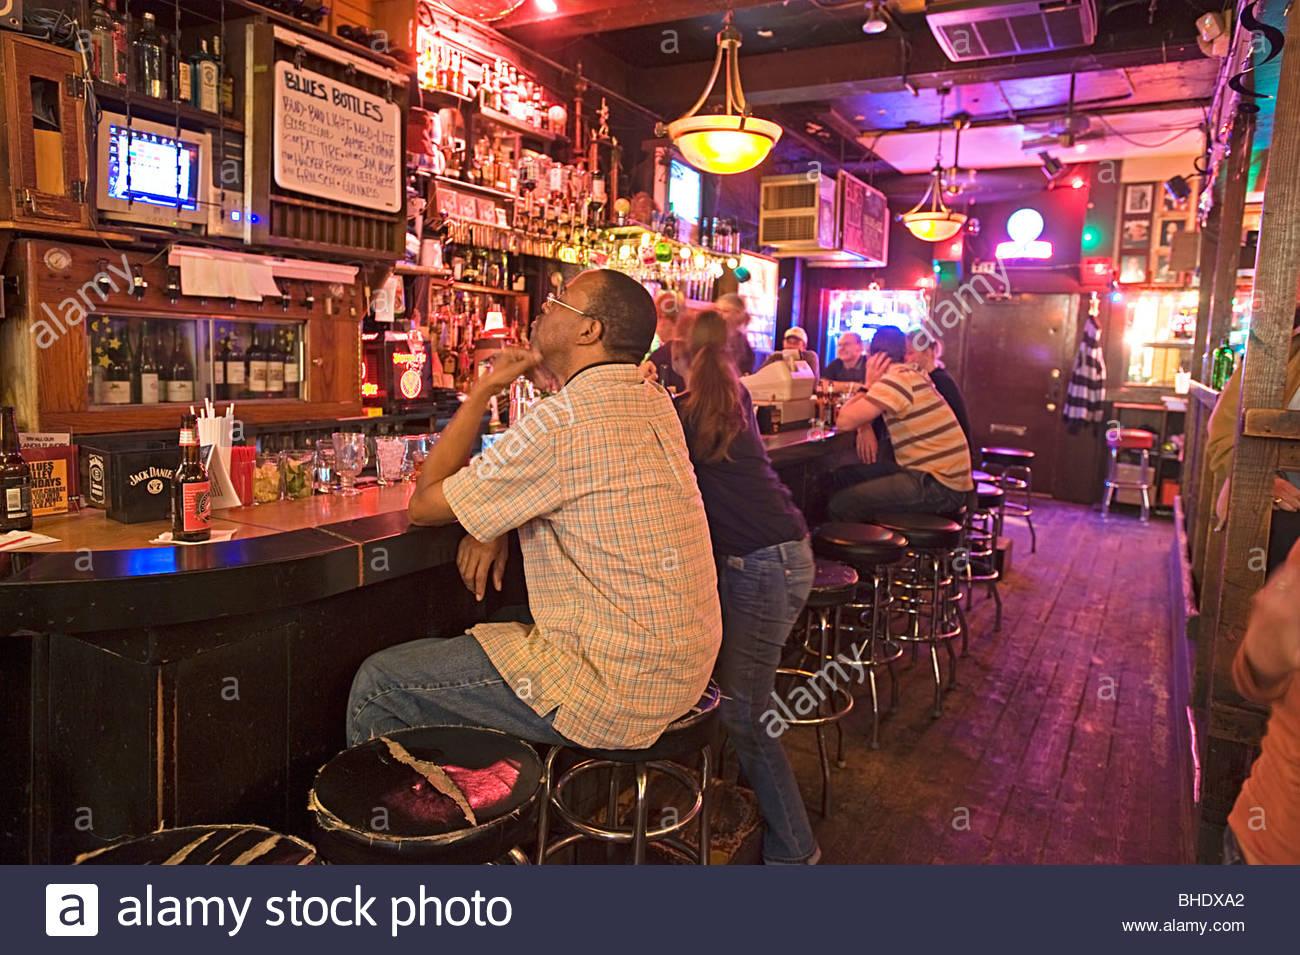 The famous 'B.L.U.E.S' blues club in the Lincoln area. Chicago, Illinois, usa - Stock Image